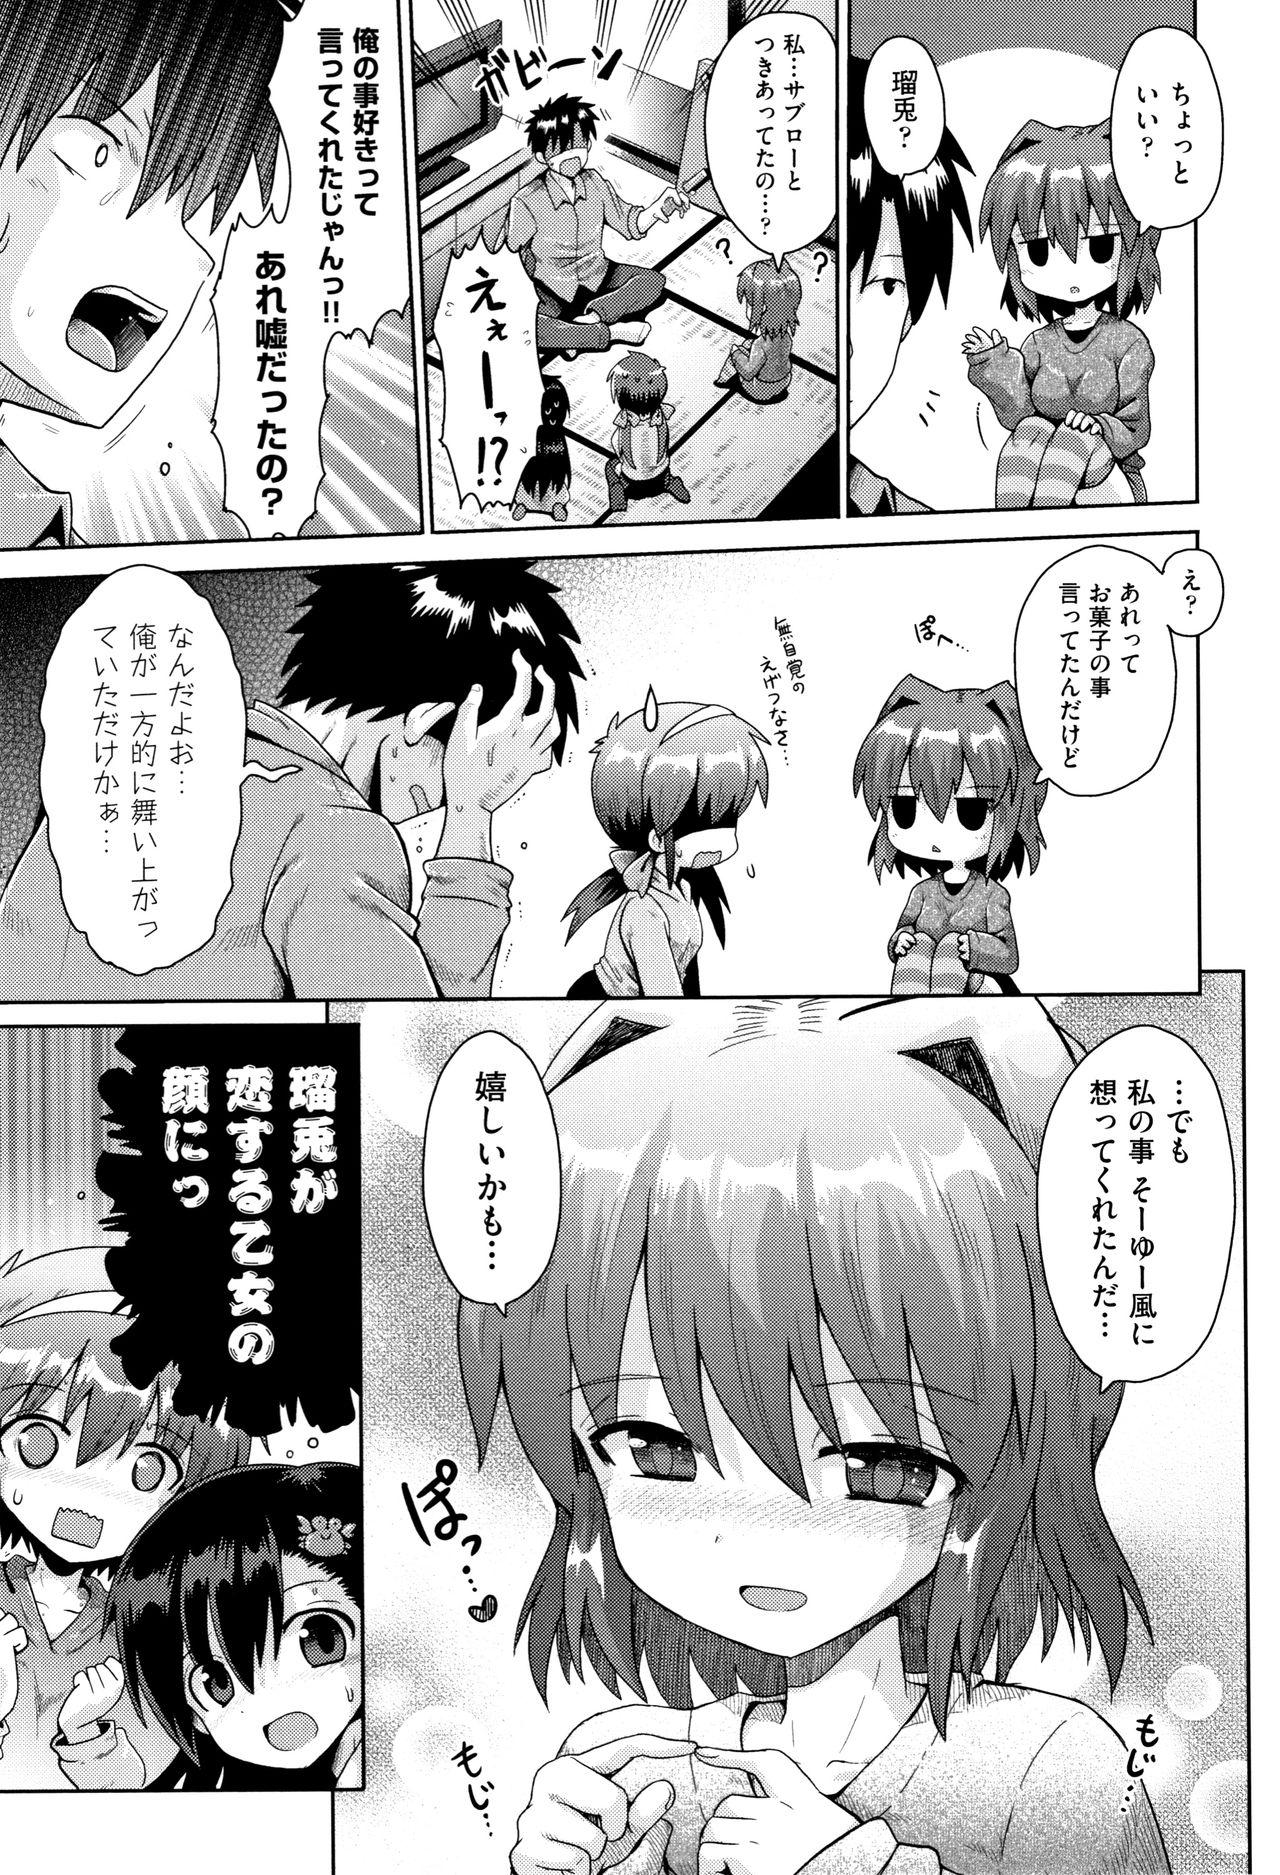 Shoujo Kumikyoku 11 15